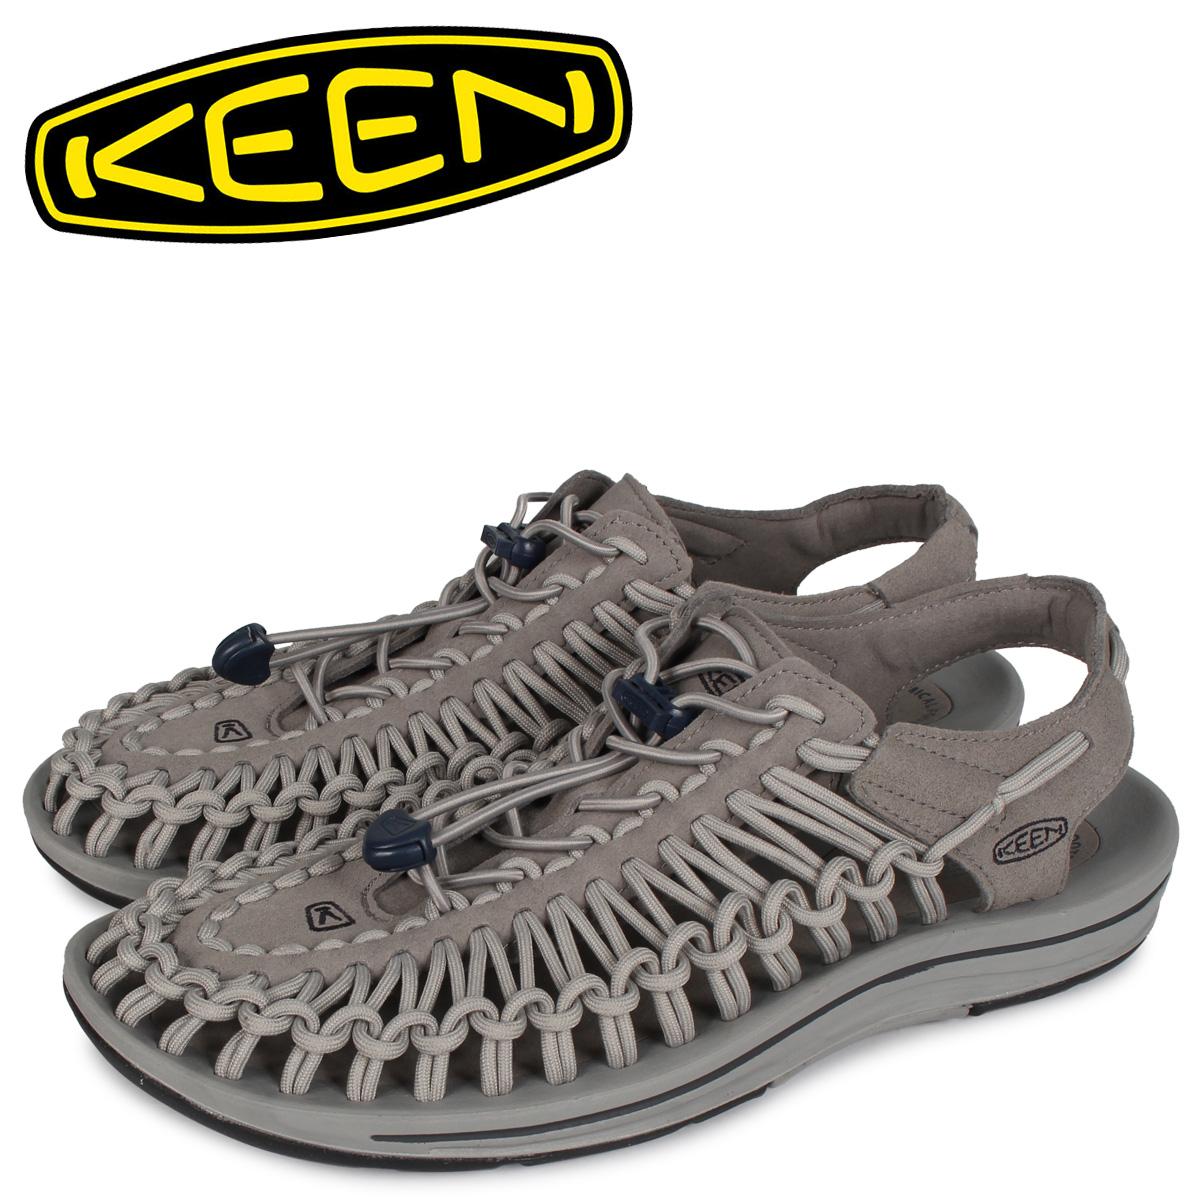 KEEN キーン ユニーク サンダル スポーツサンダル メンズ UNEEK グレー 1023043 [予約 5月中旬 新入荷予定]